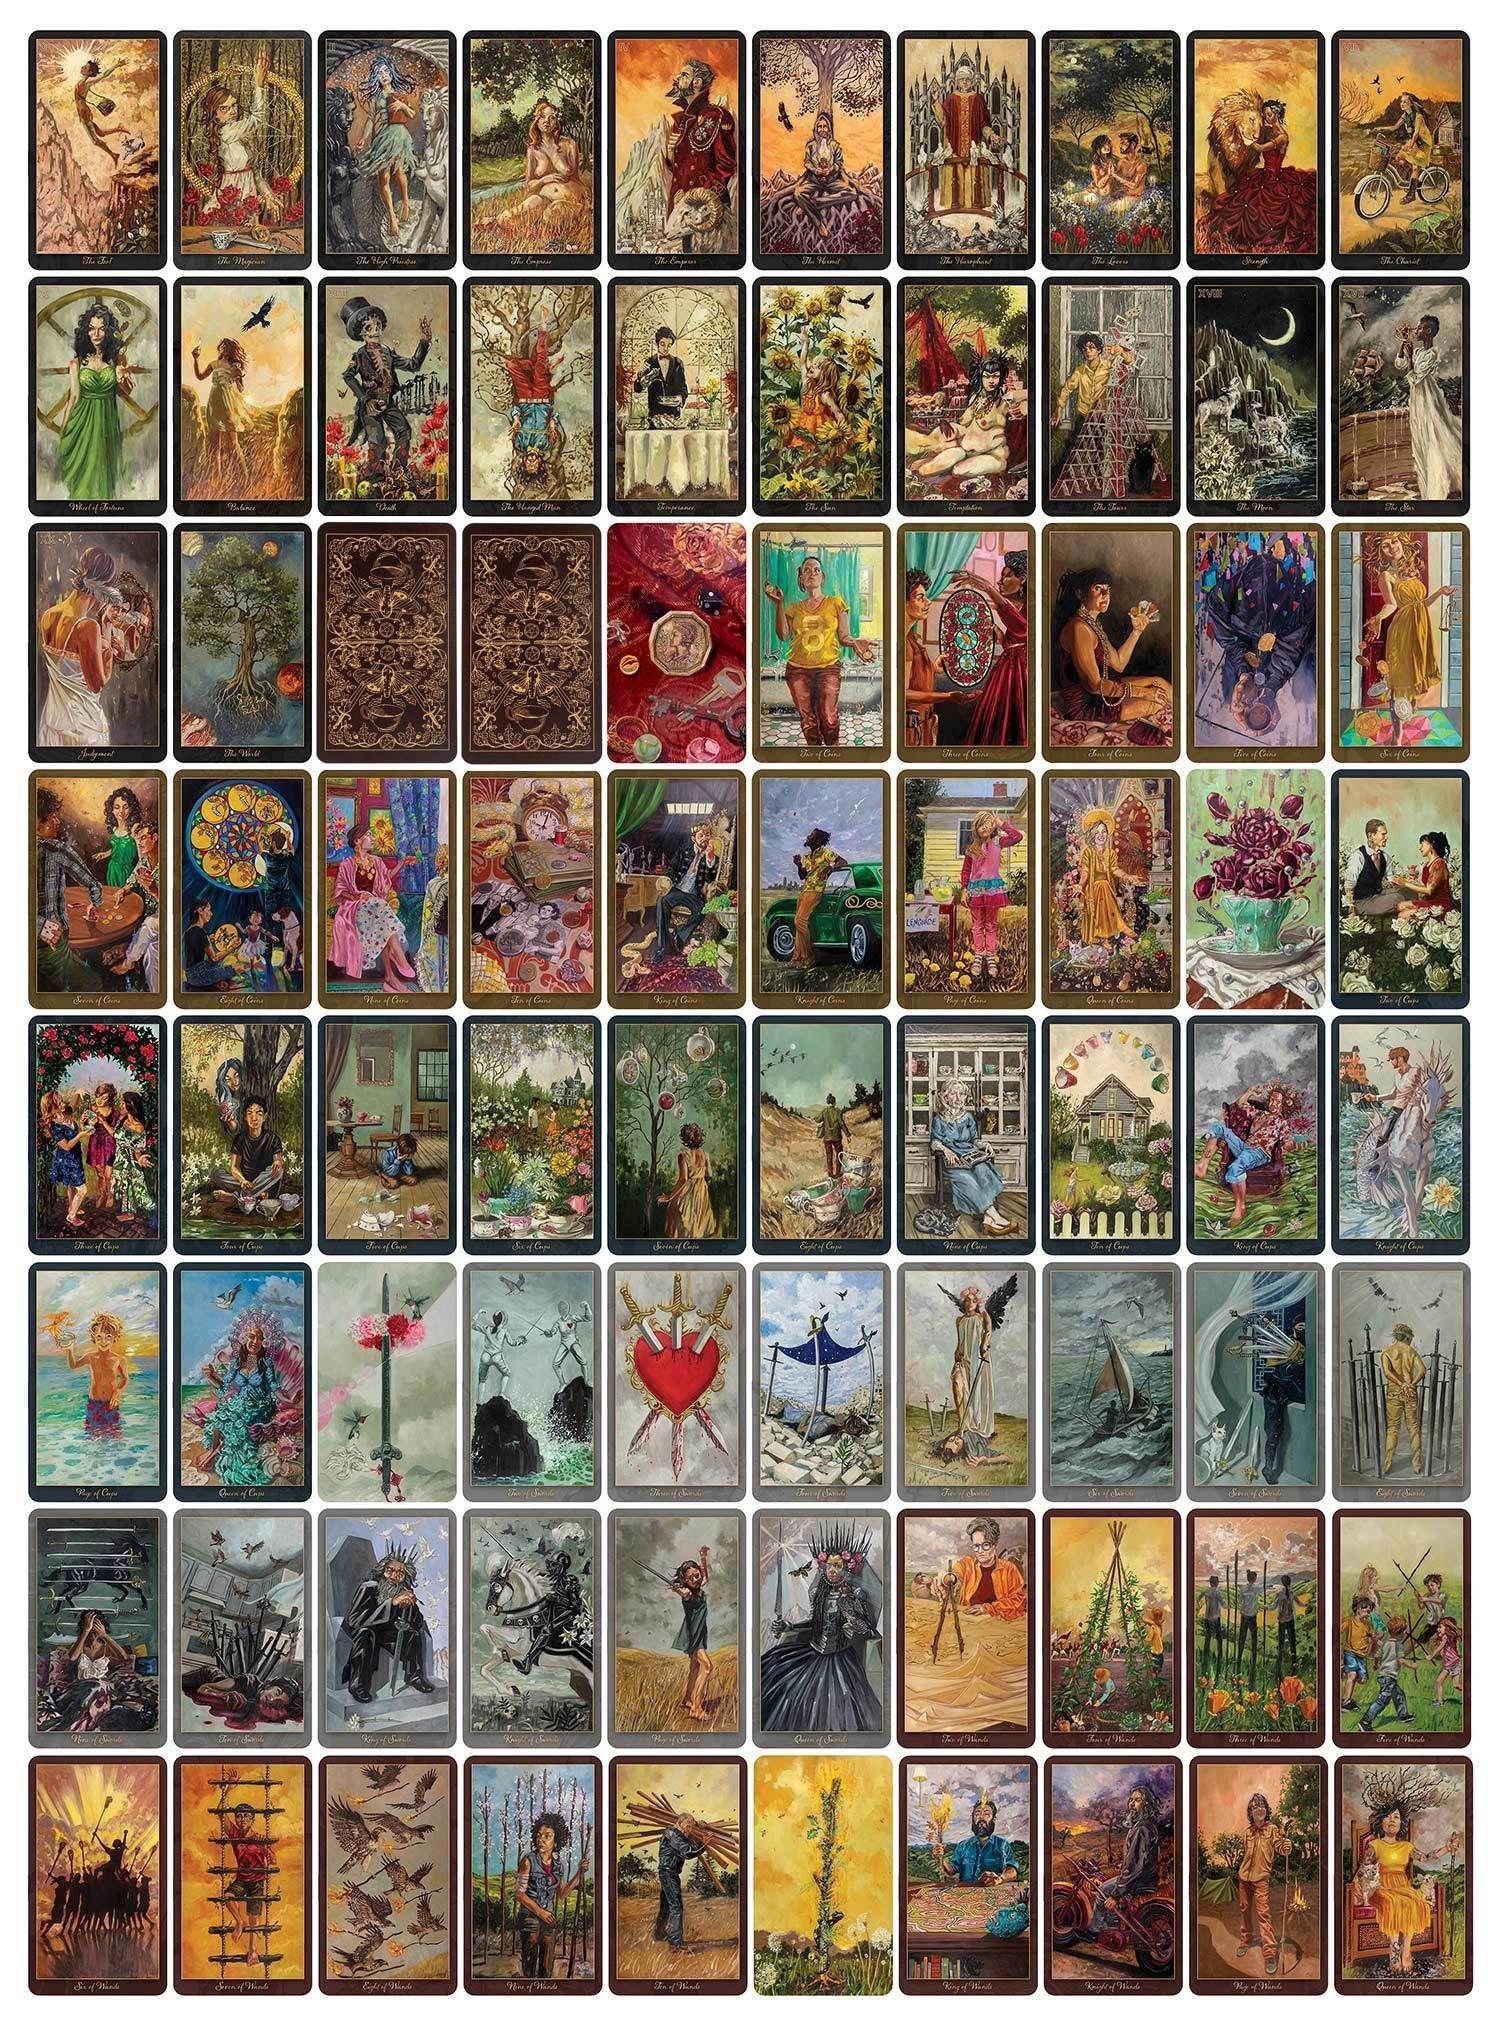 The Slow Tarot In 2020 Tarot Cards Art Unique Tarot Decks The